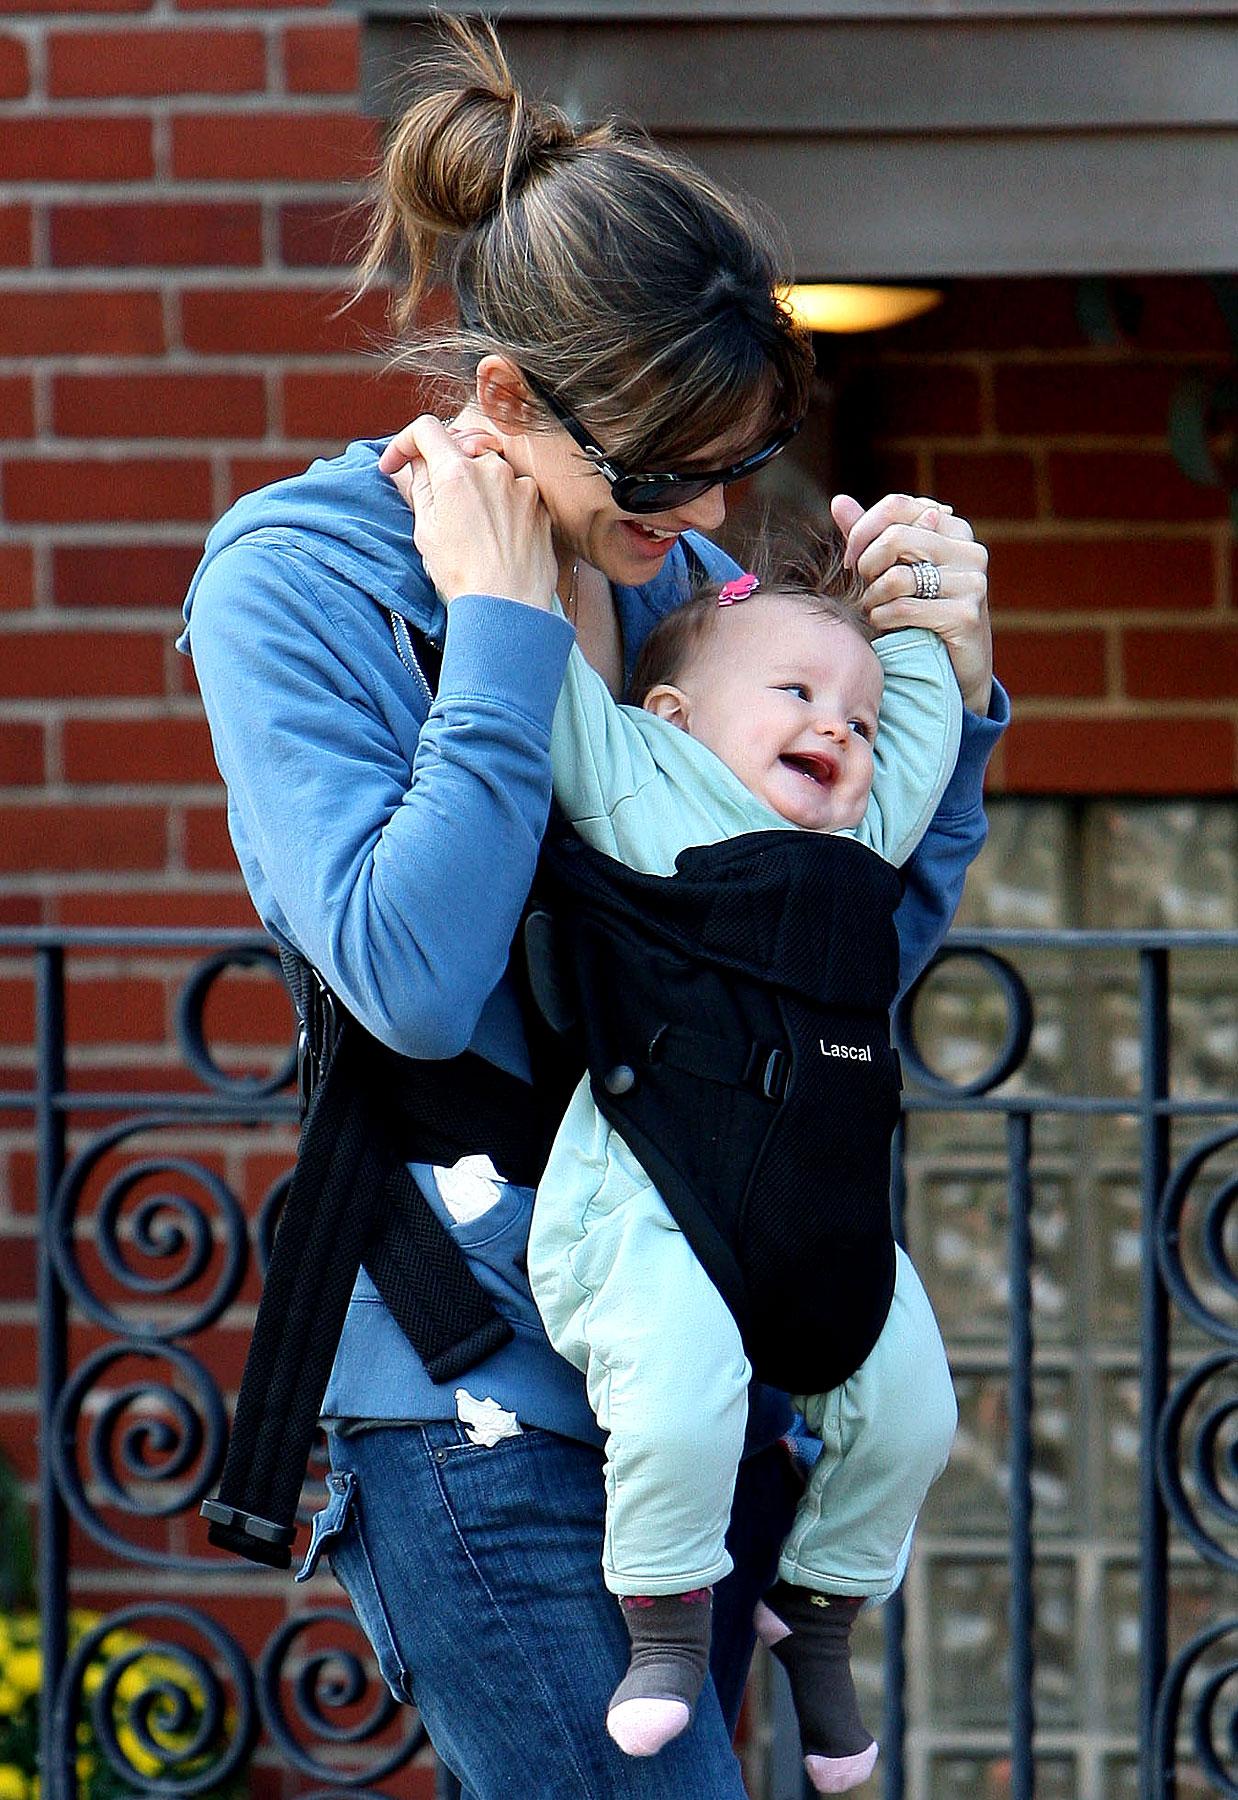 PHOTO GALLERY: Jennifer Garner Gives Seraphina a Lift